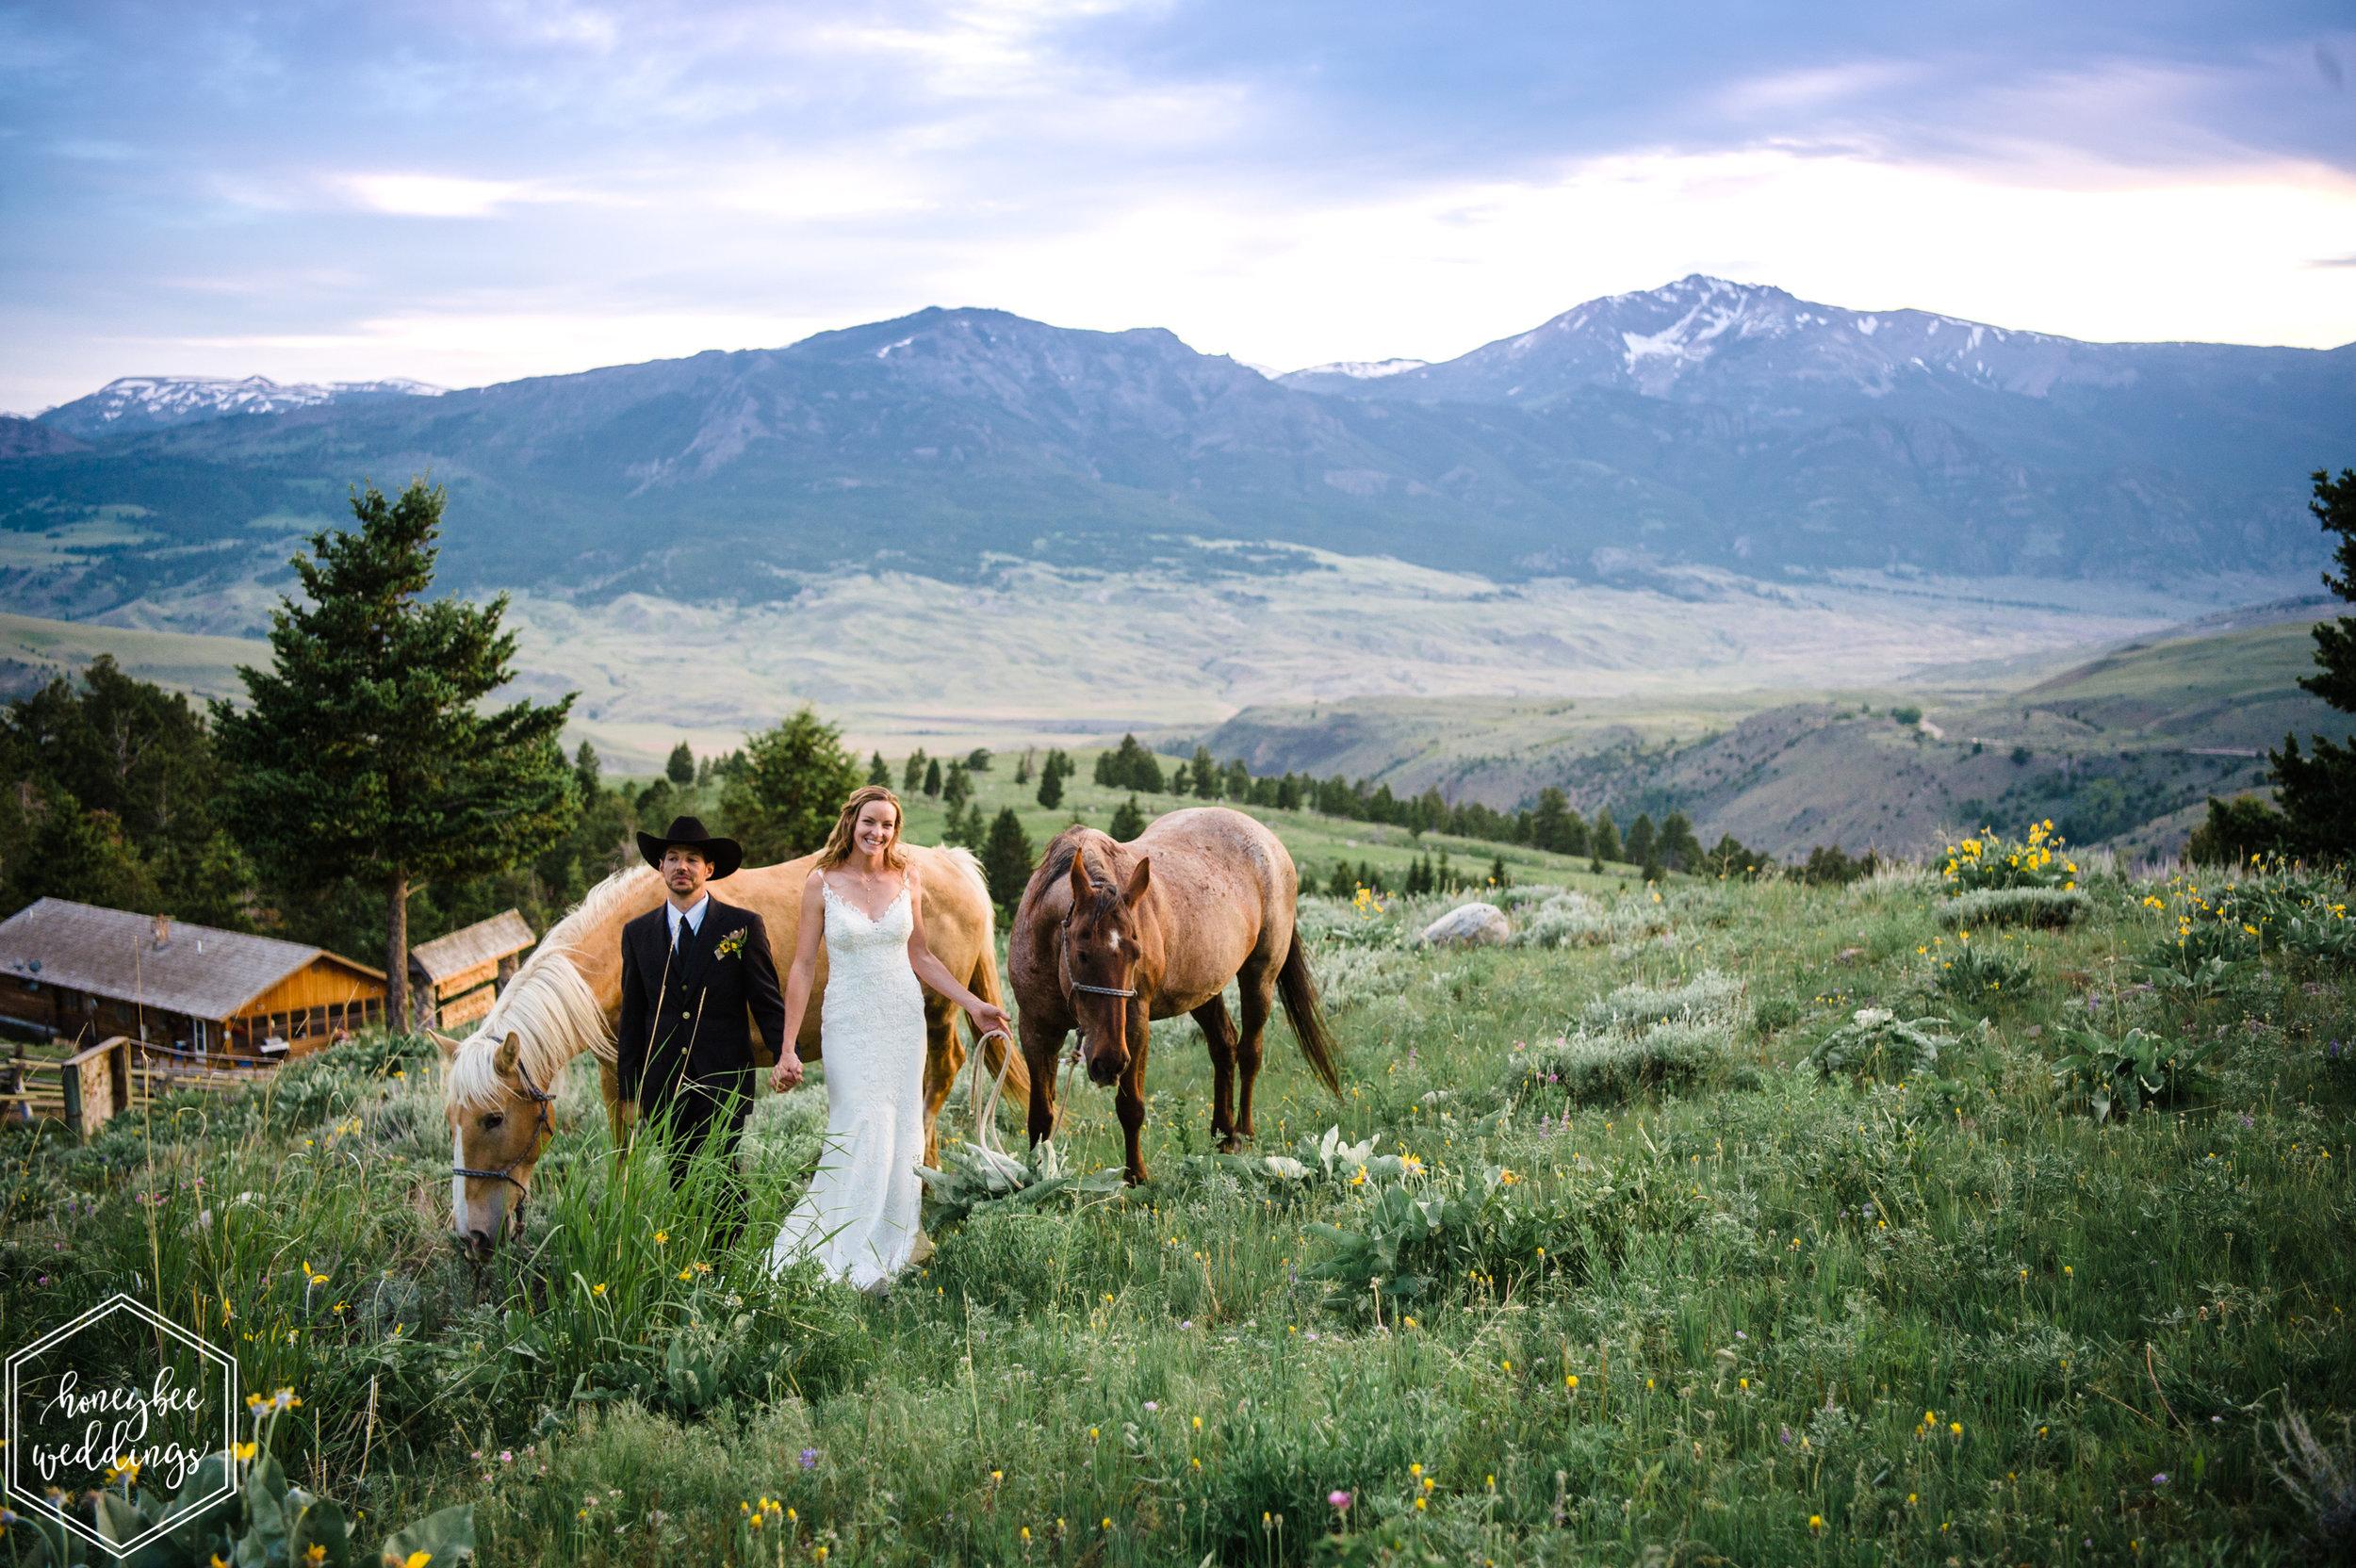 252Yellowstone National Park Wedding_Montana Wedding Photographer_Honeybee Weddings_Shannon & Jonathan_June 29, 2019-1079.jpg